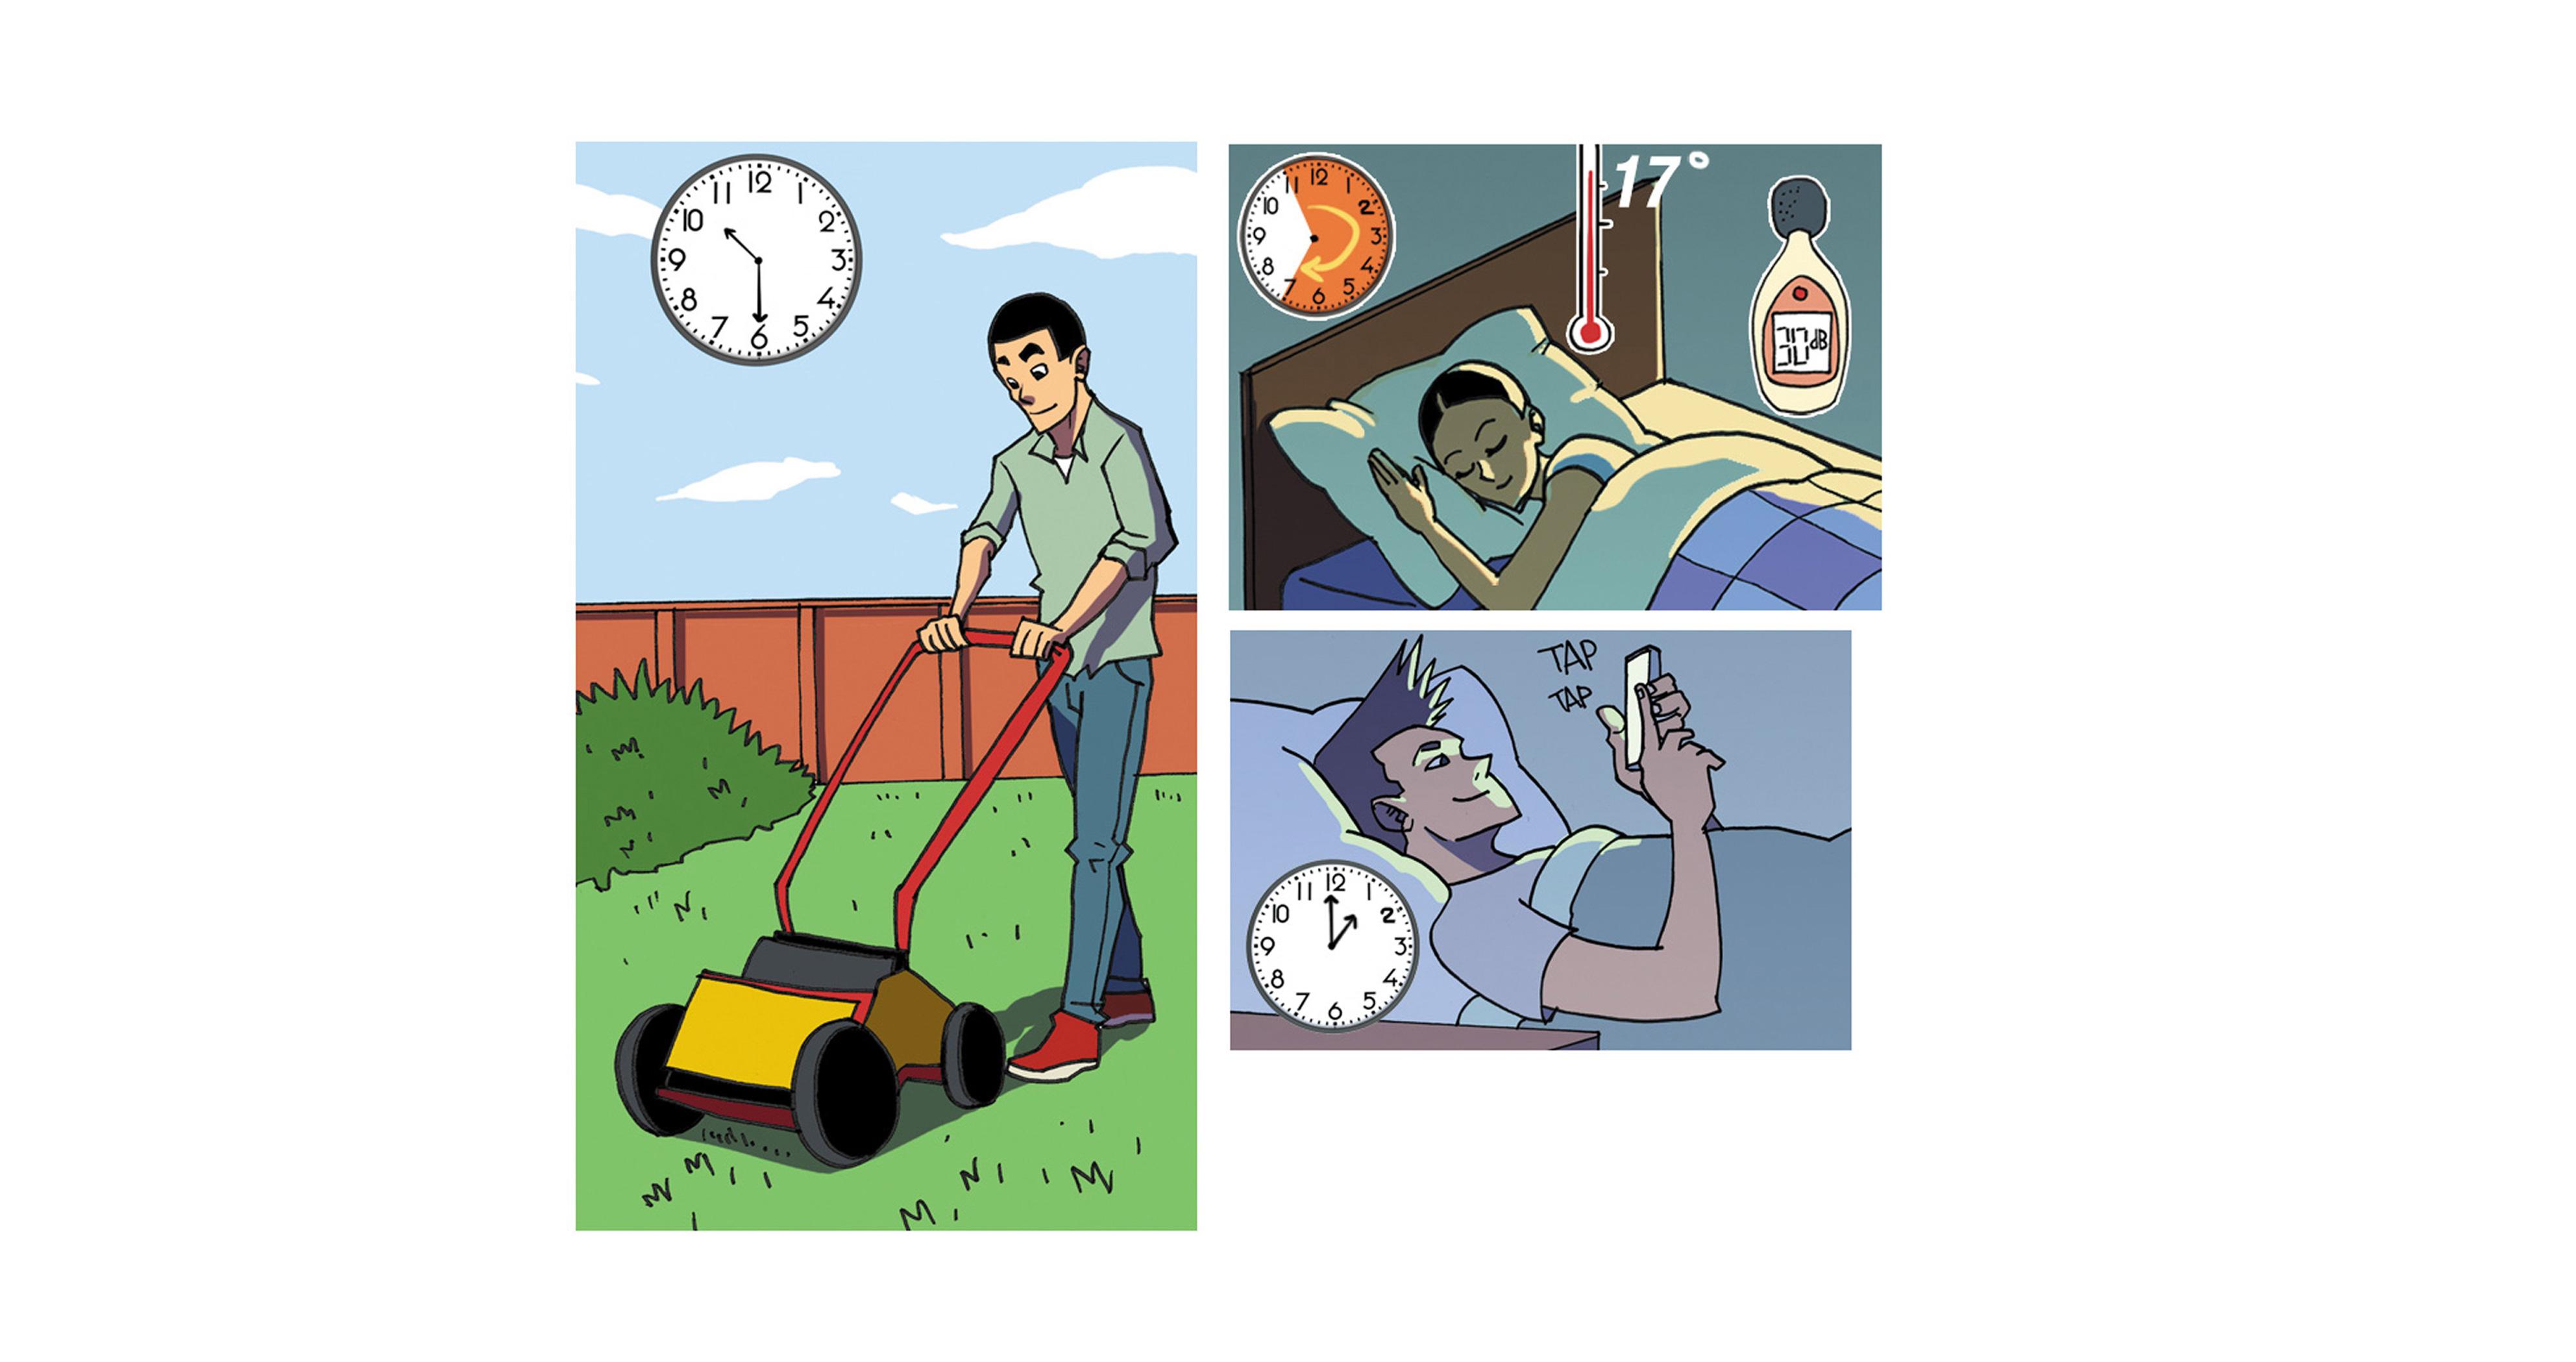 alfonso recio illustration vie quotidienne edition